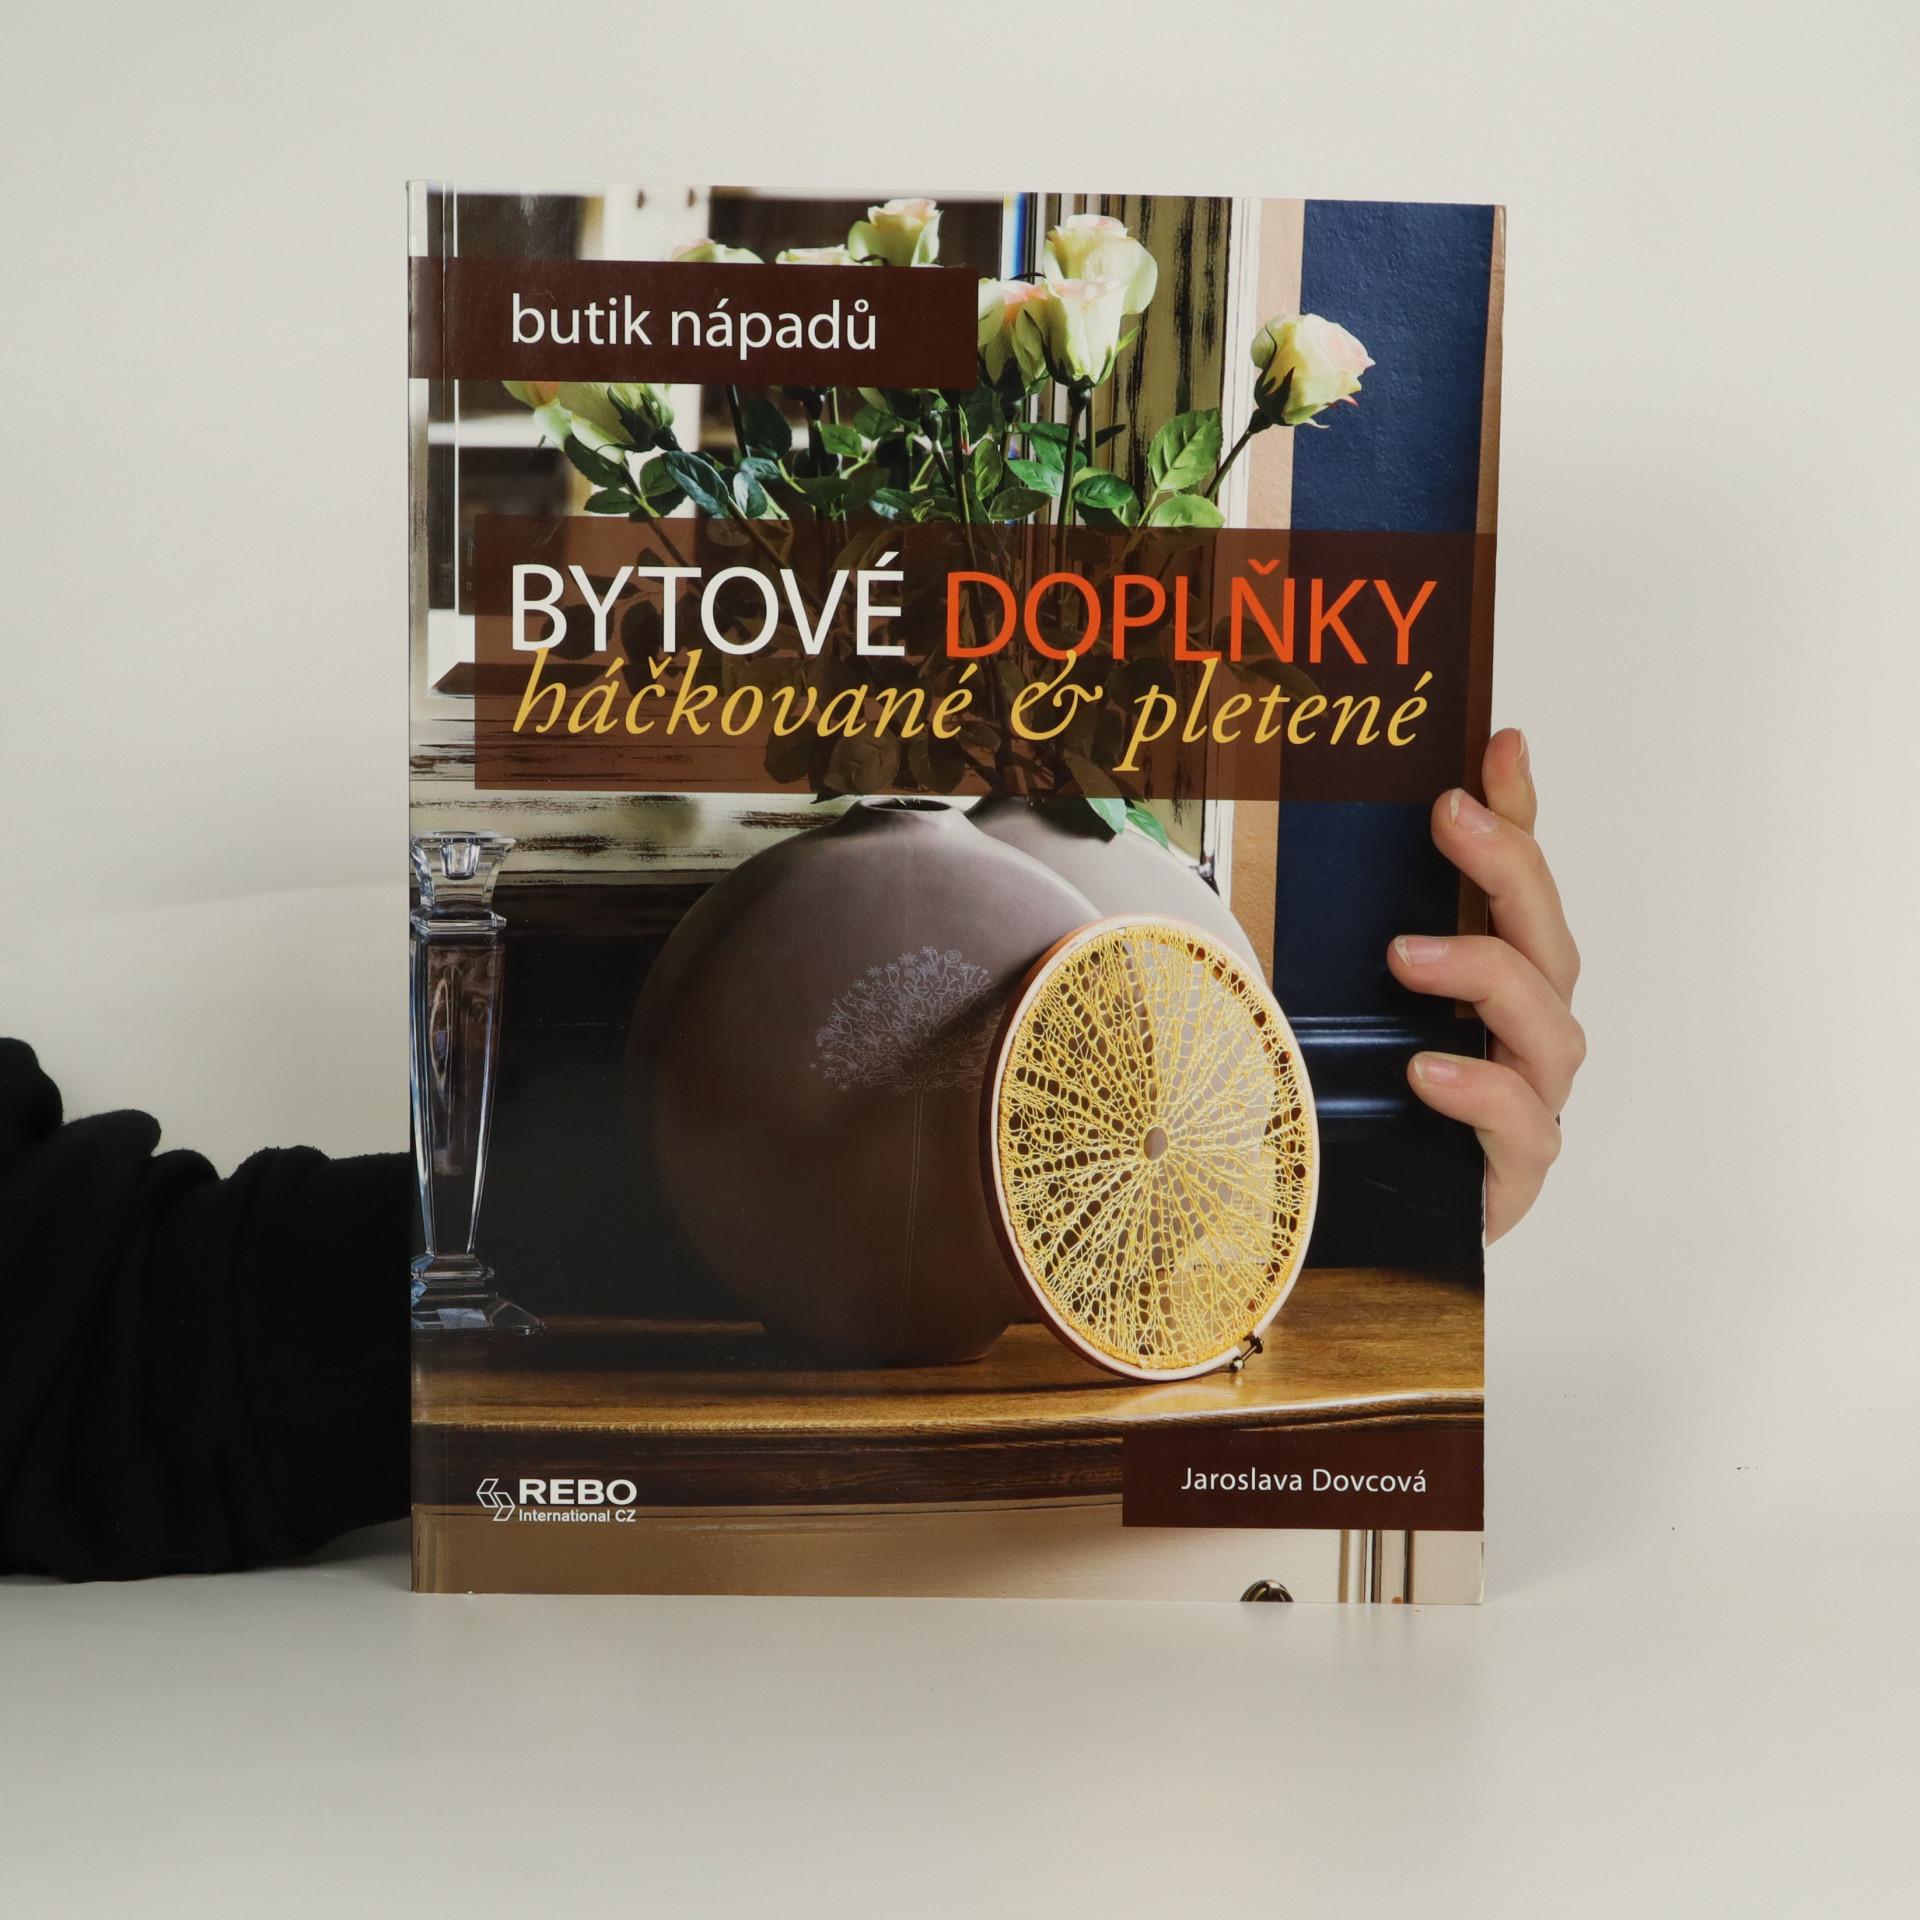 antikvární kniha Bytové doplňky. Háčkované & pletené, 2014